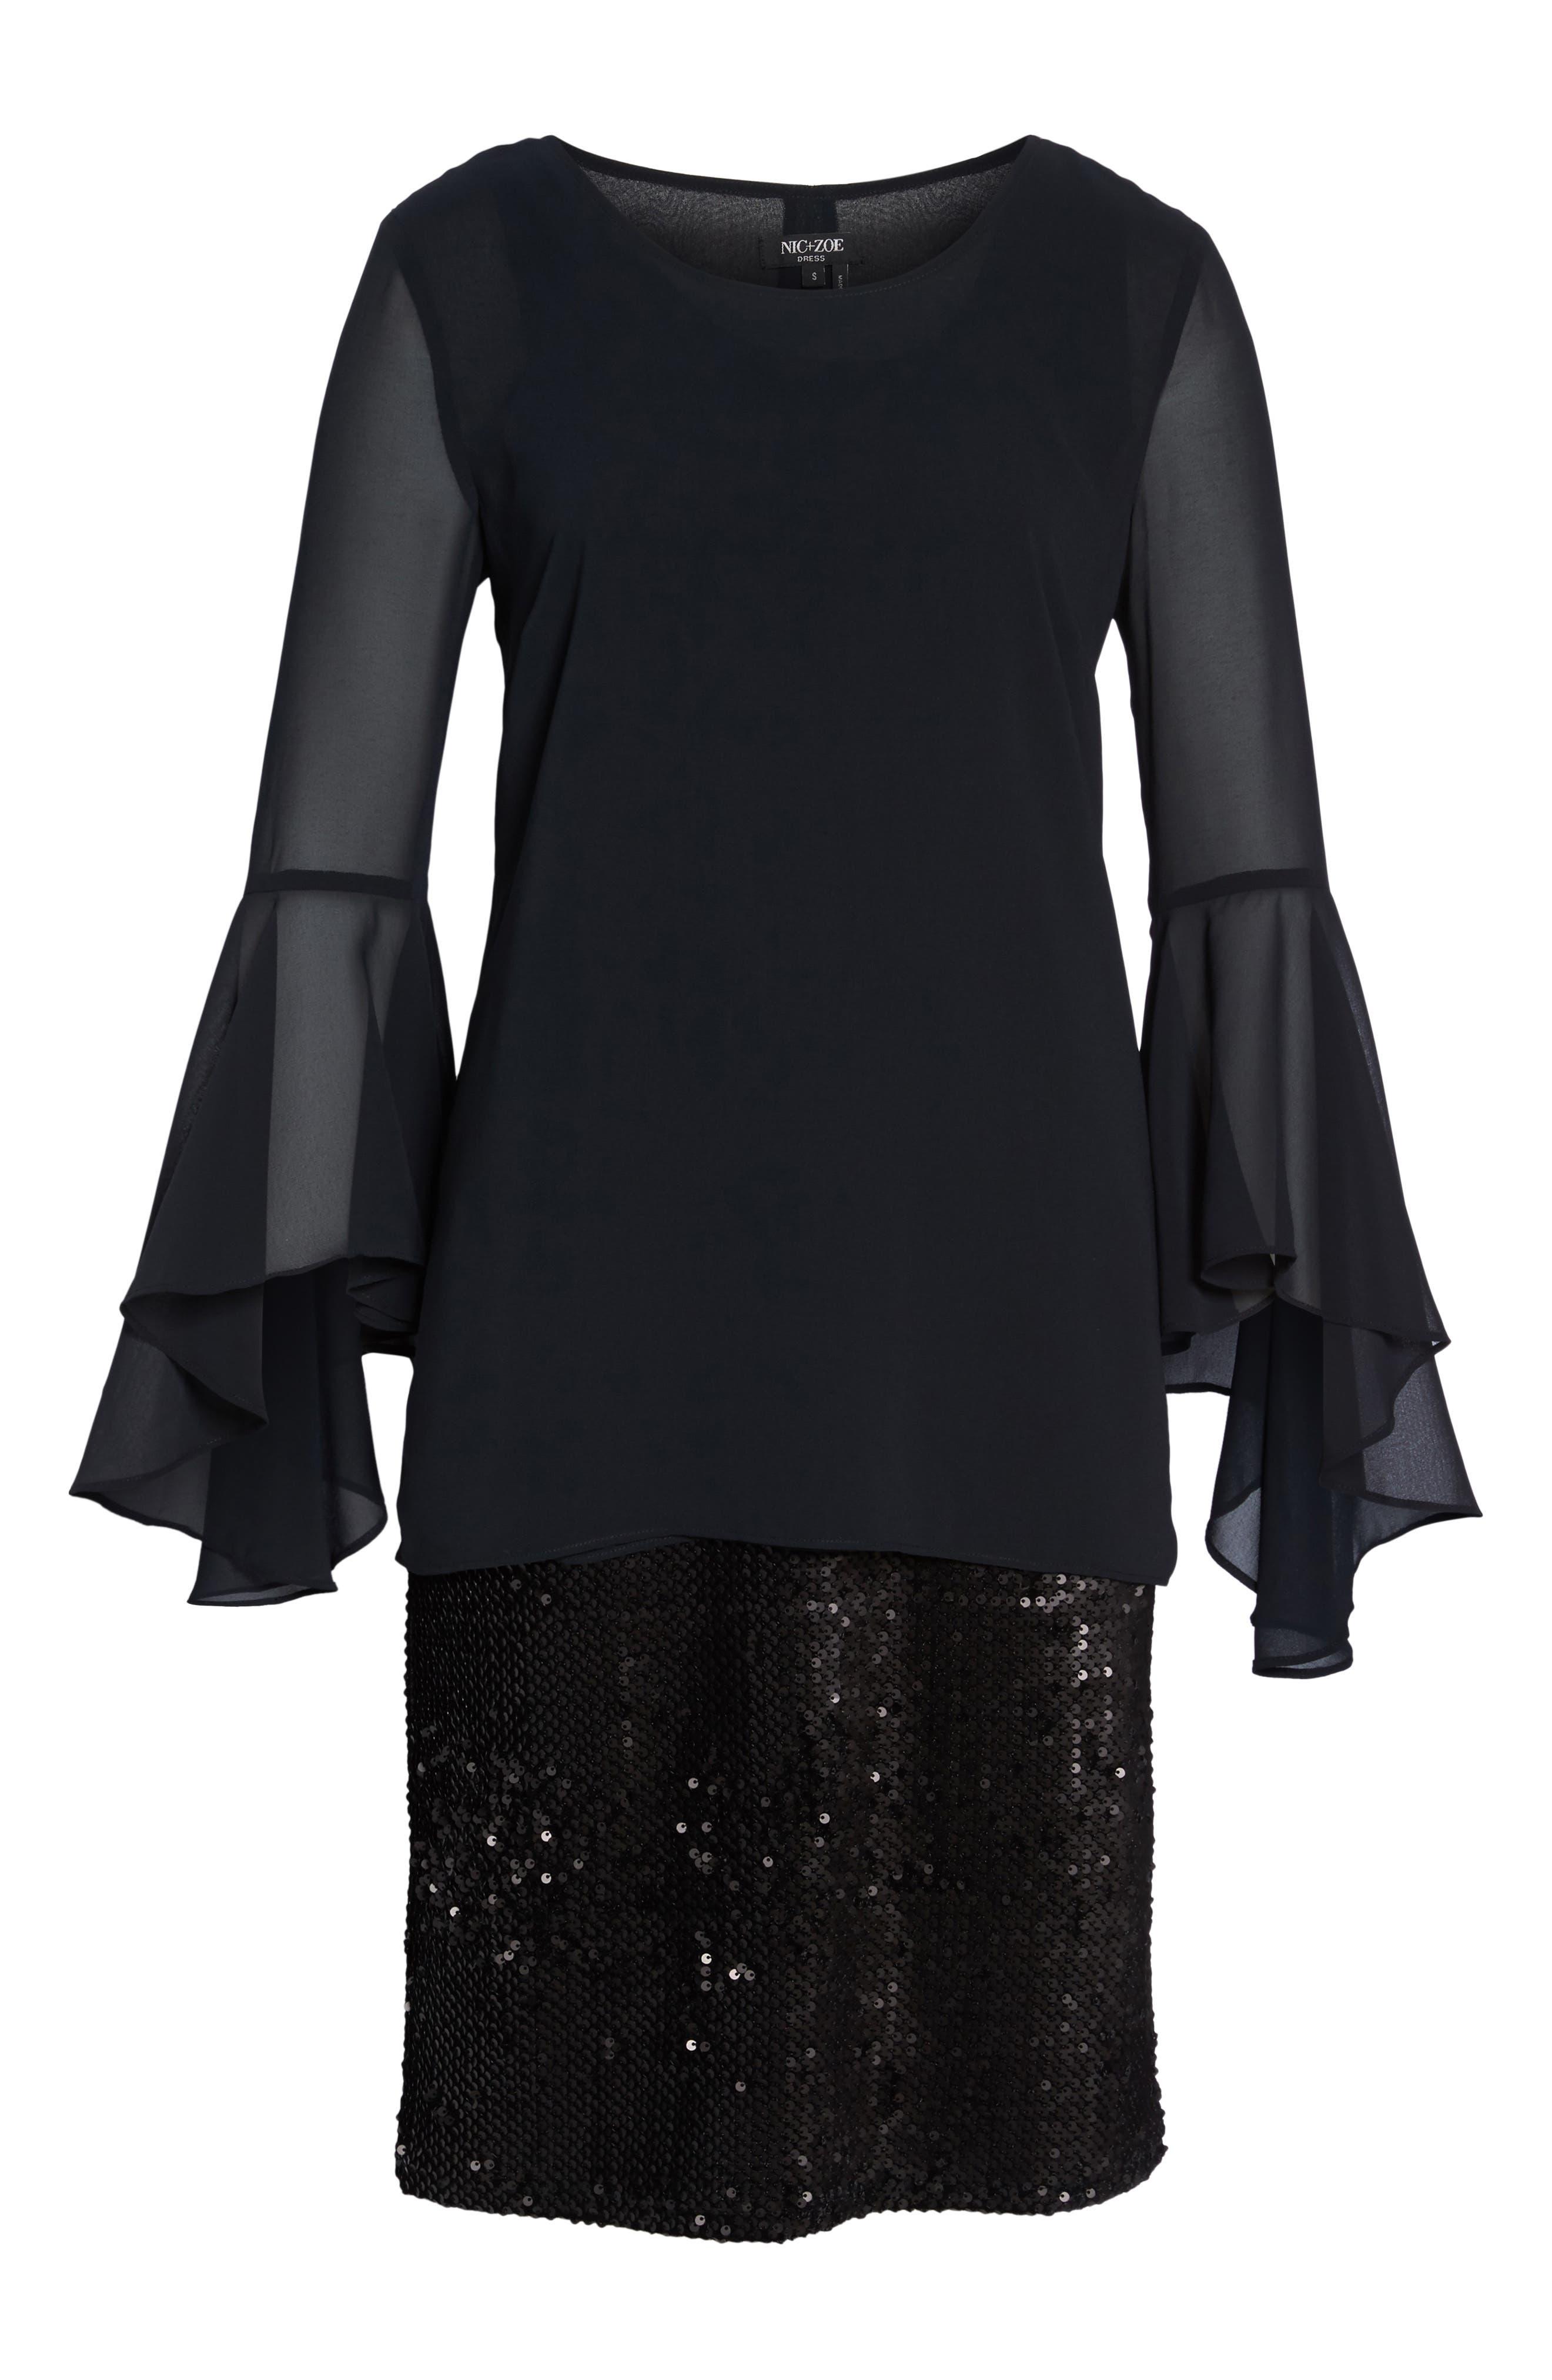 Sequin Chiffon Dress,                             Alternate thumbnail 6, color,                             Black Onyx